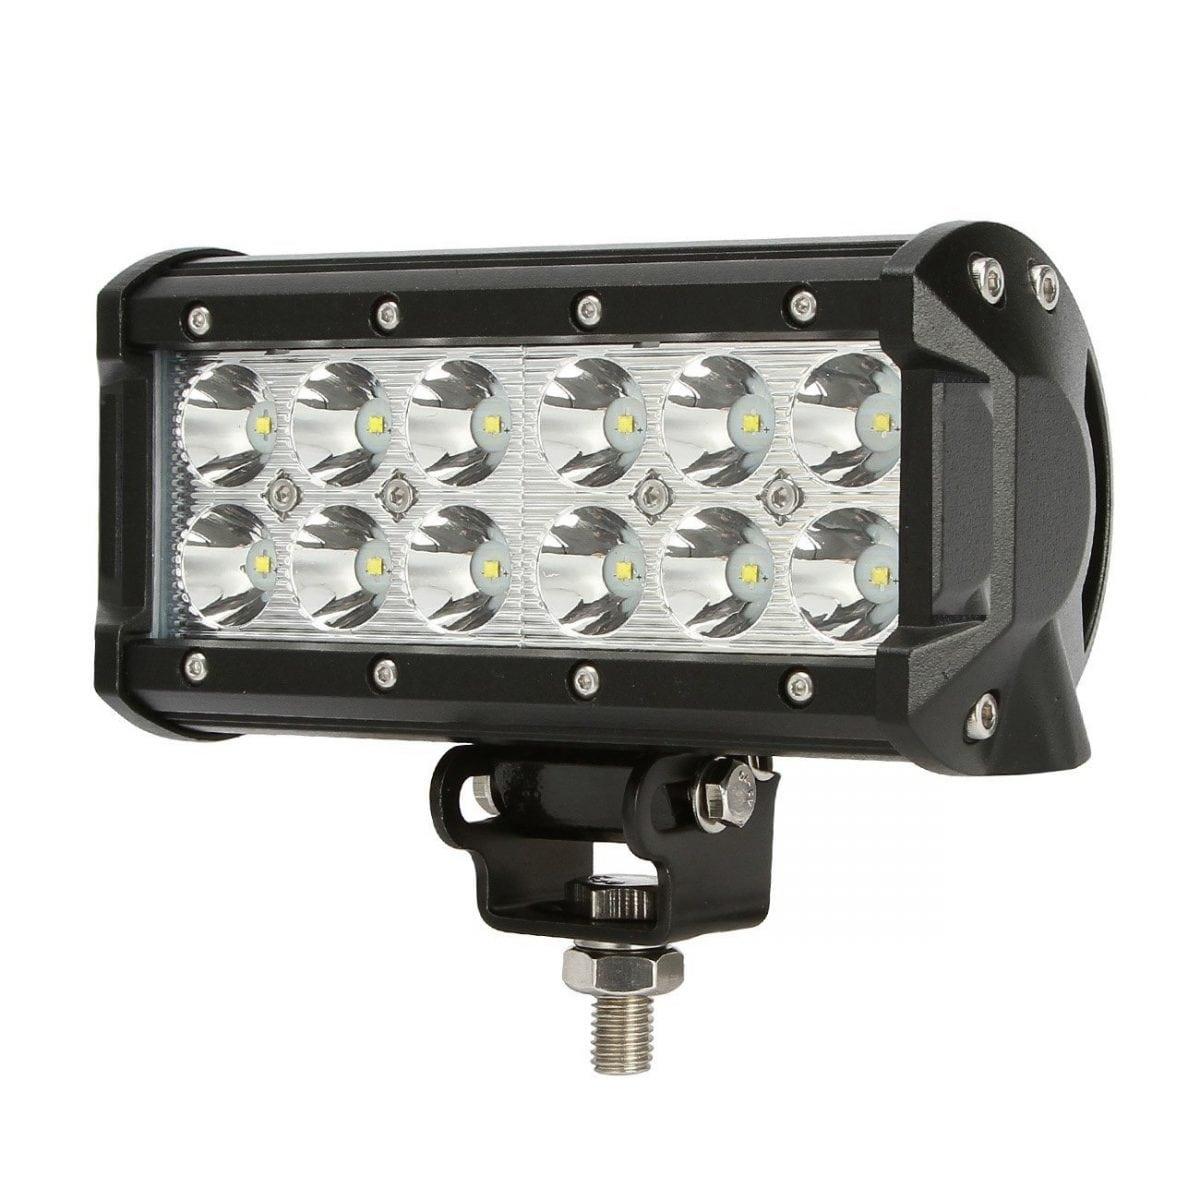 Led Work Lights Flood Spotlights Equipped Wiring Up Vulture Mini 36 Watt